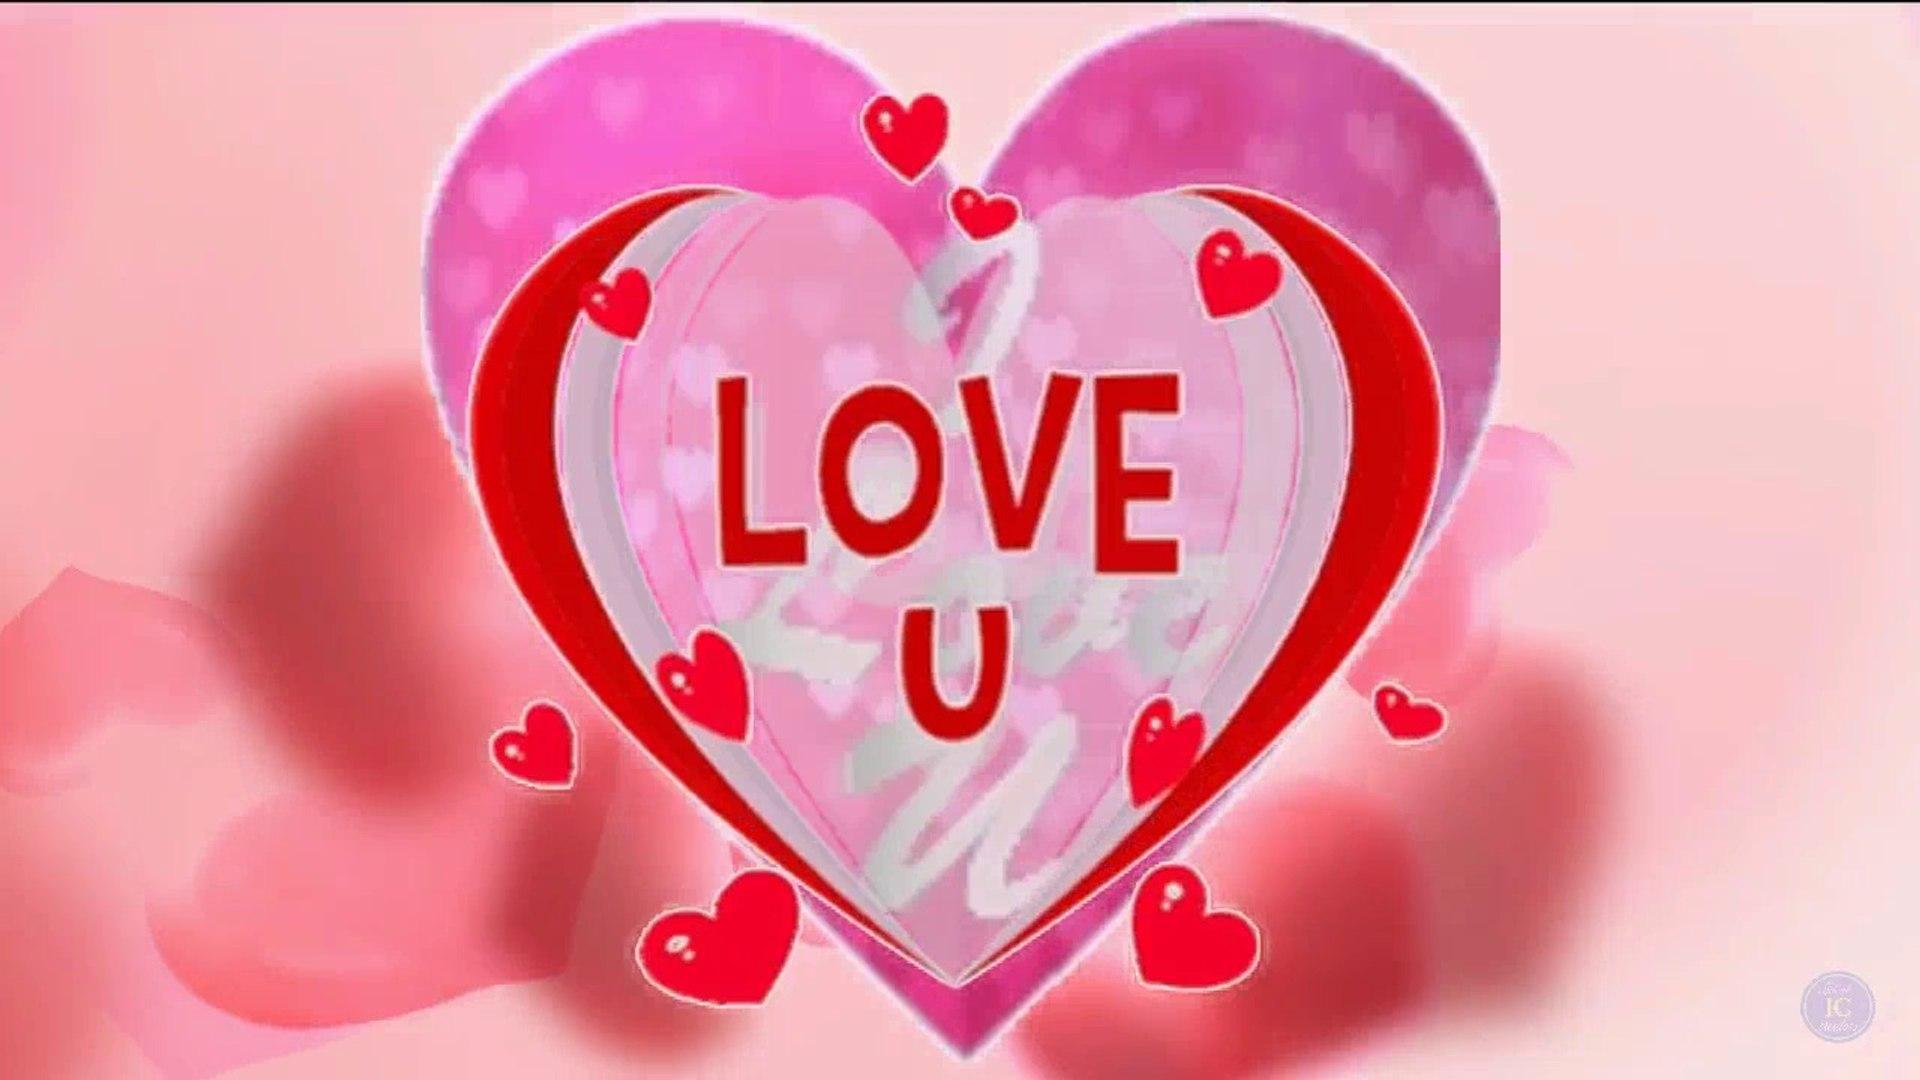 I Love You Whatsapp Status Love Letter Whatsapp Status 679708